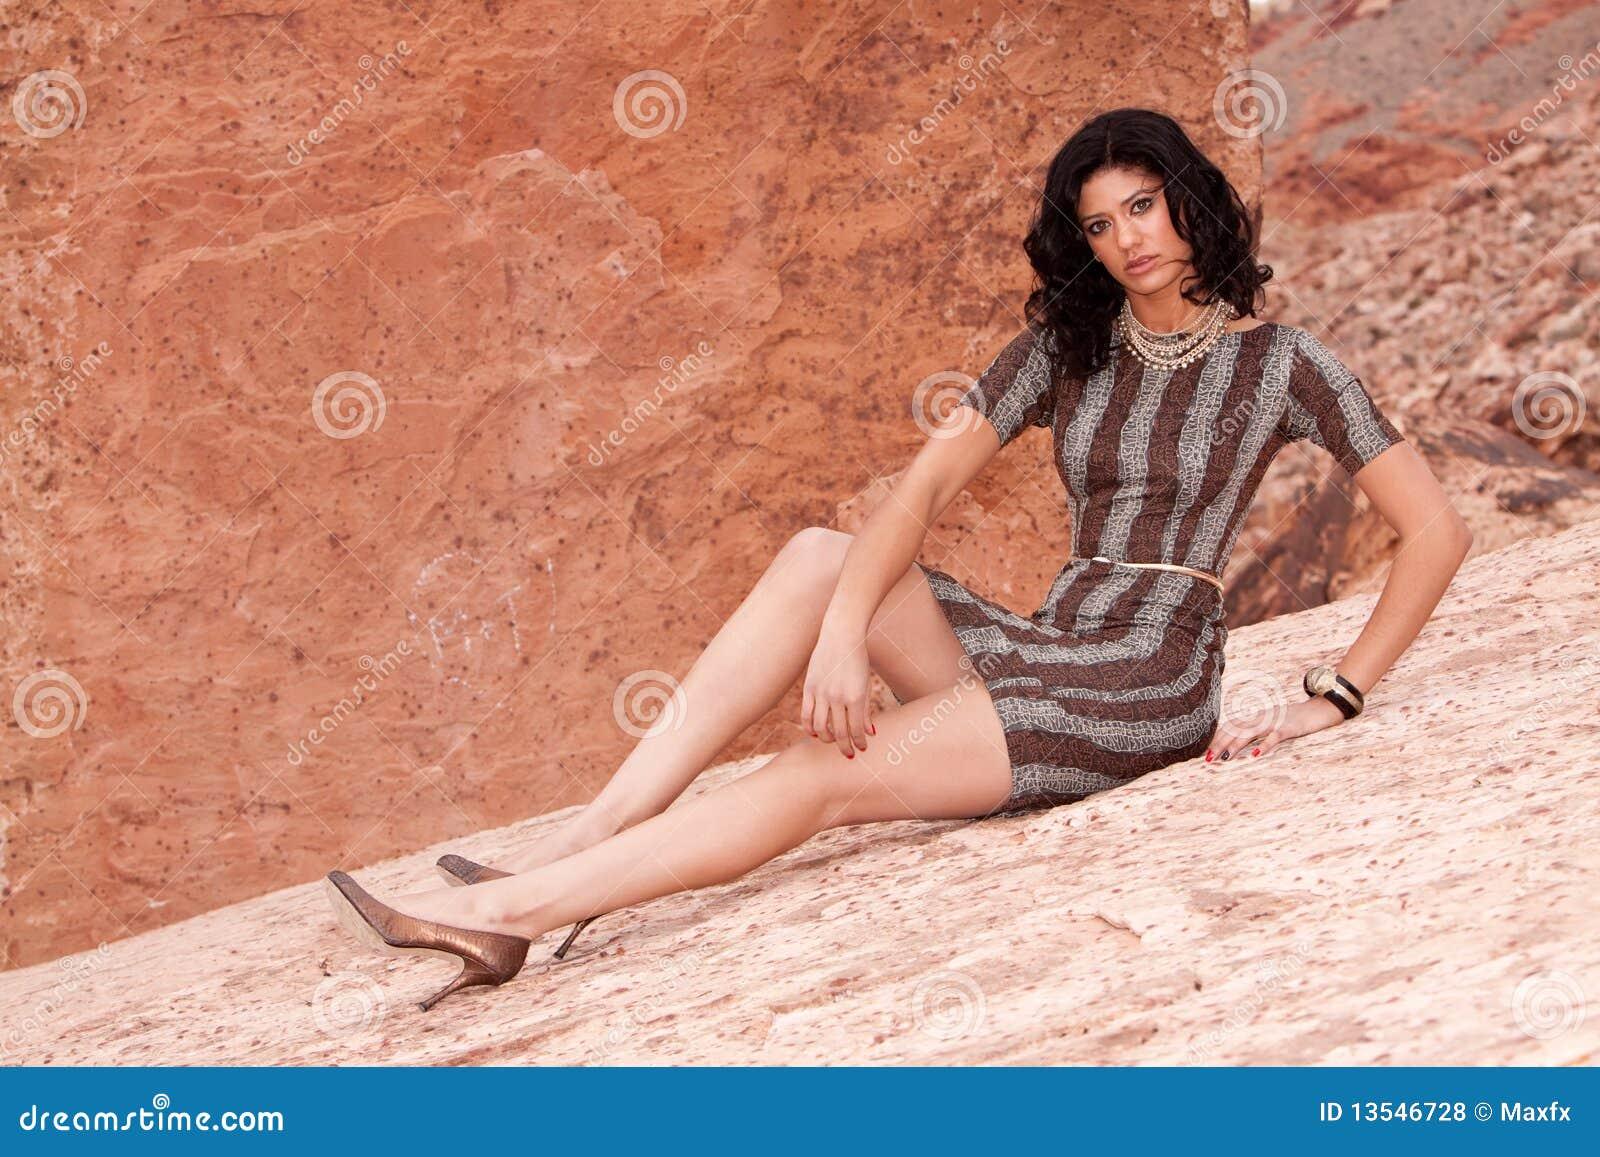 joli femme dans la robe sexy photos libres de droits image 13546728. Black Bedroom Furniture Sets. Home Design Ideas